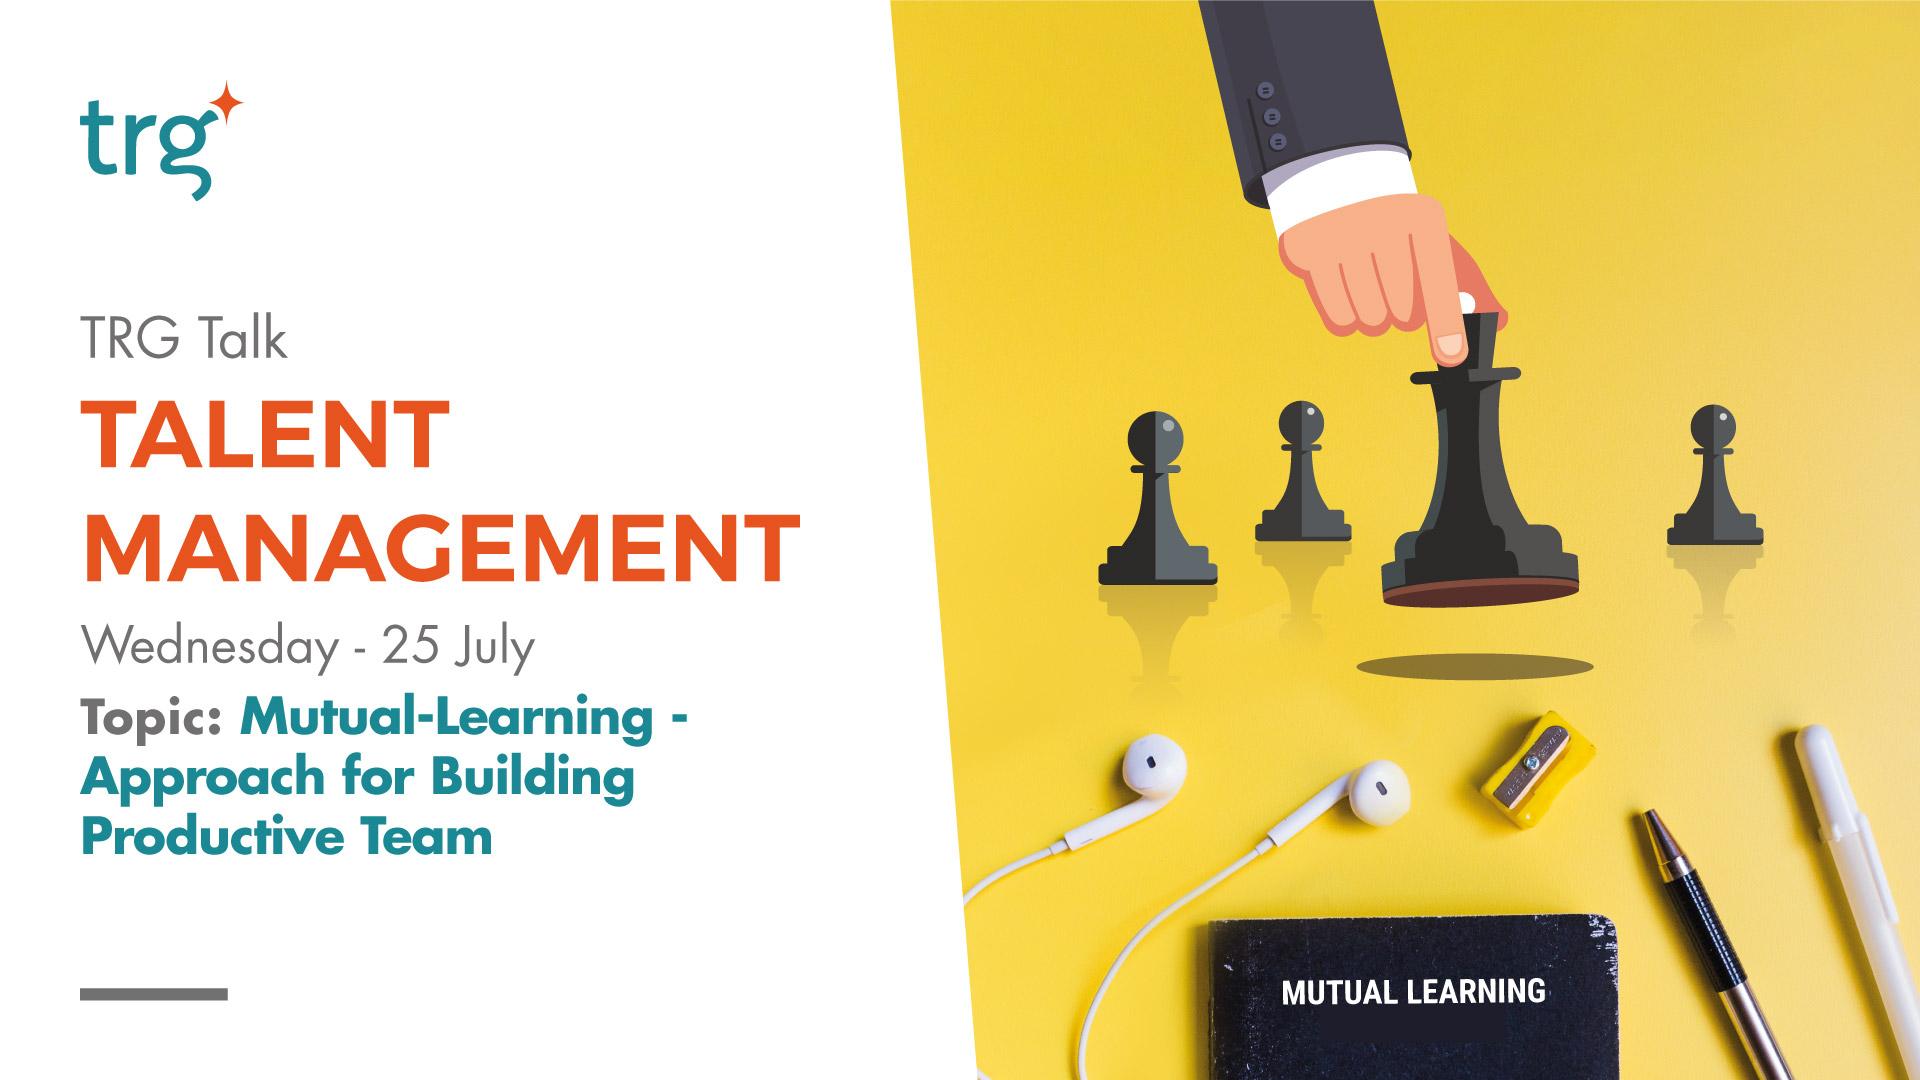 TRG Talk Talent management July 2018